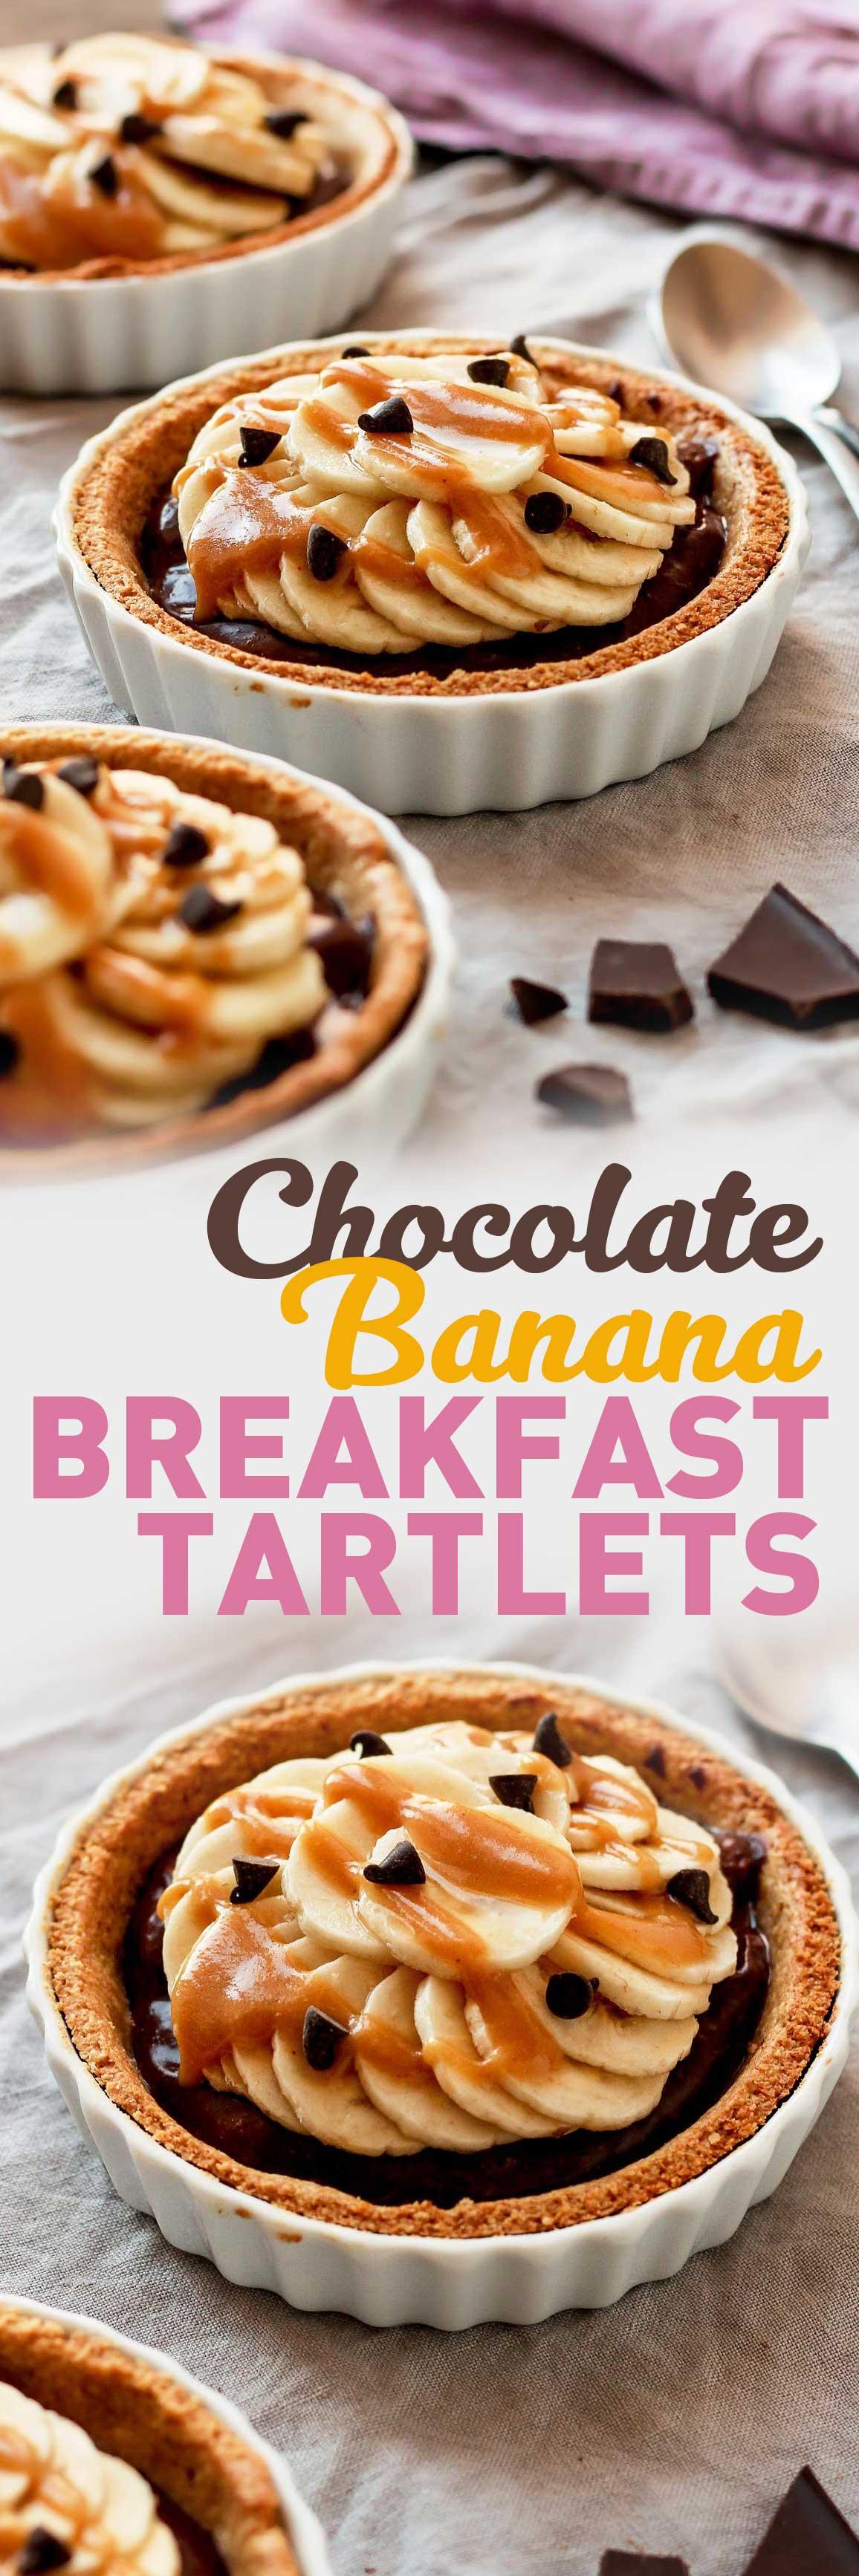 Chocolate Banana Breakfast Tartlets